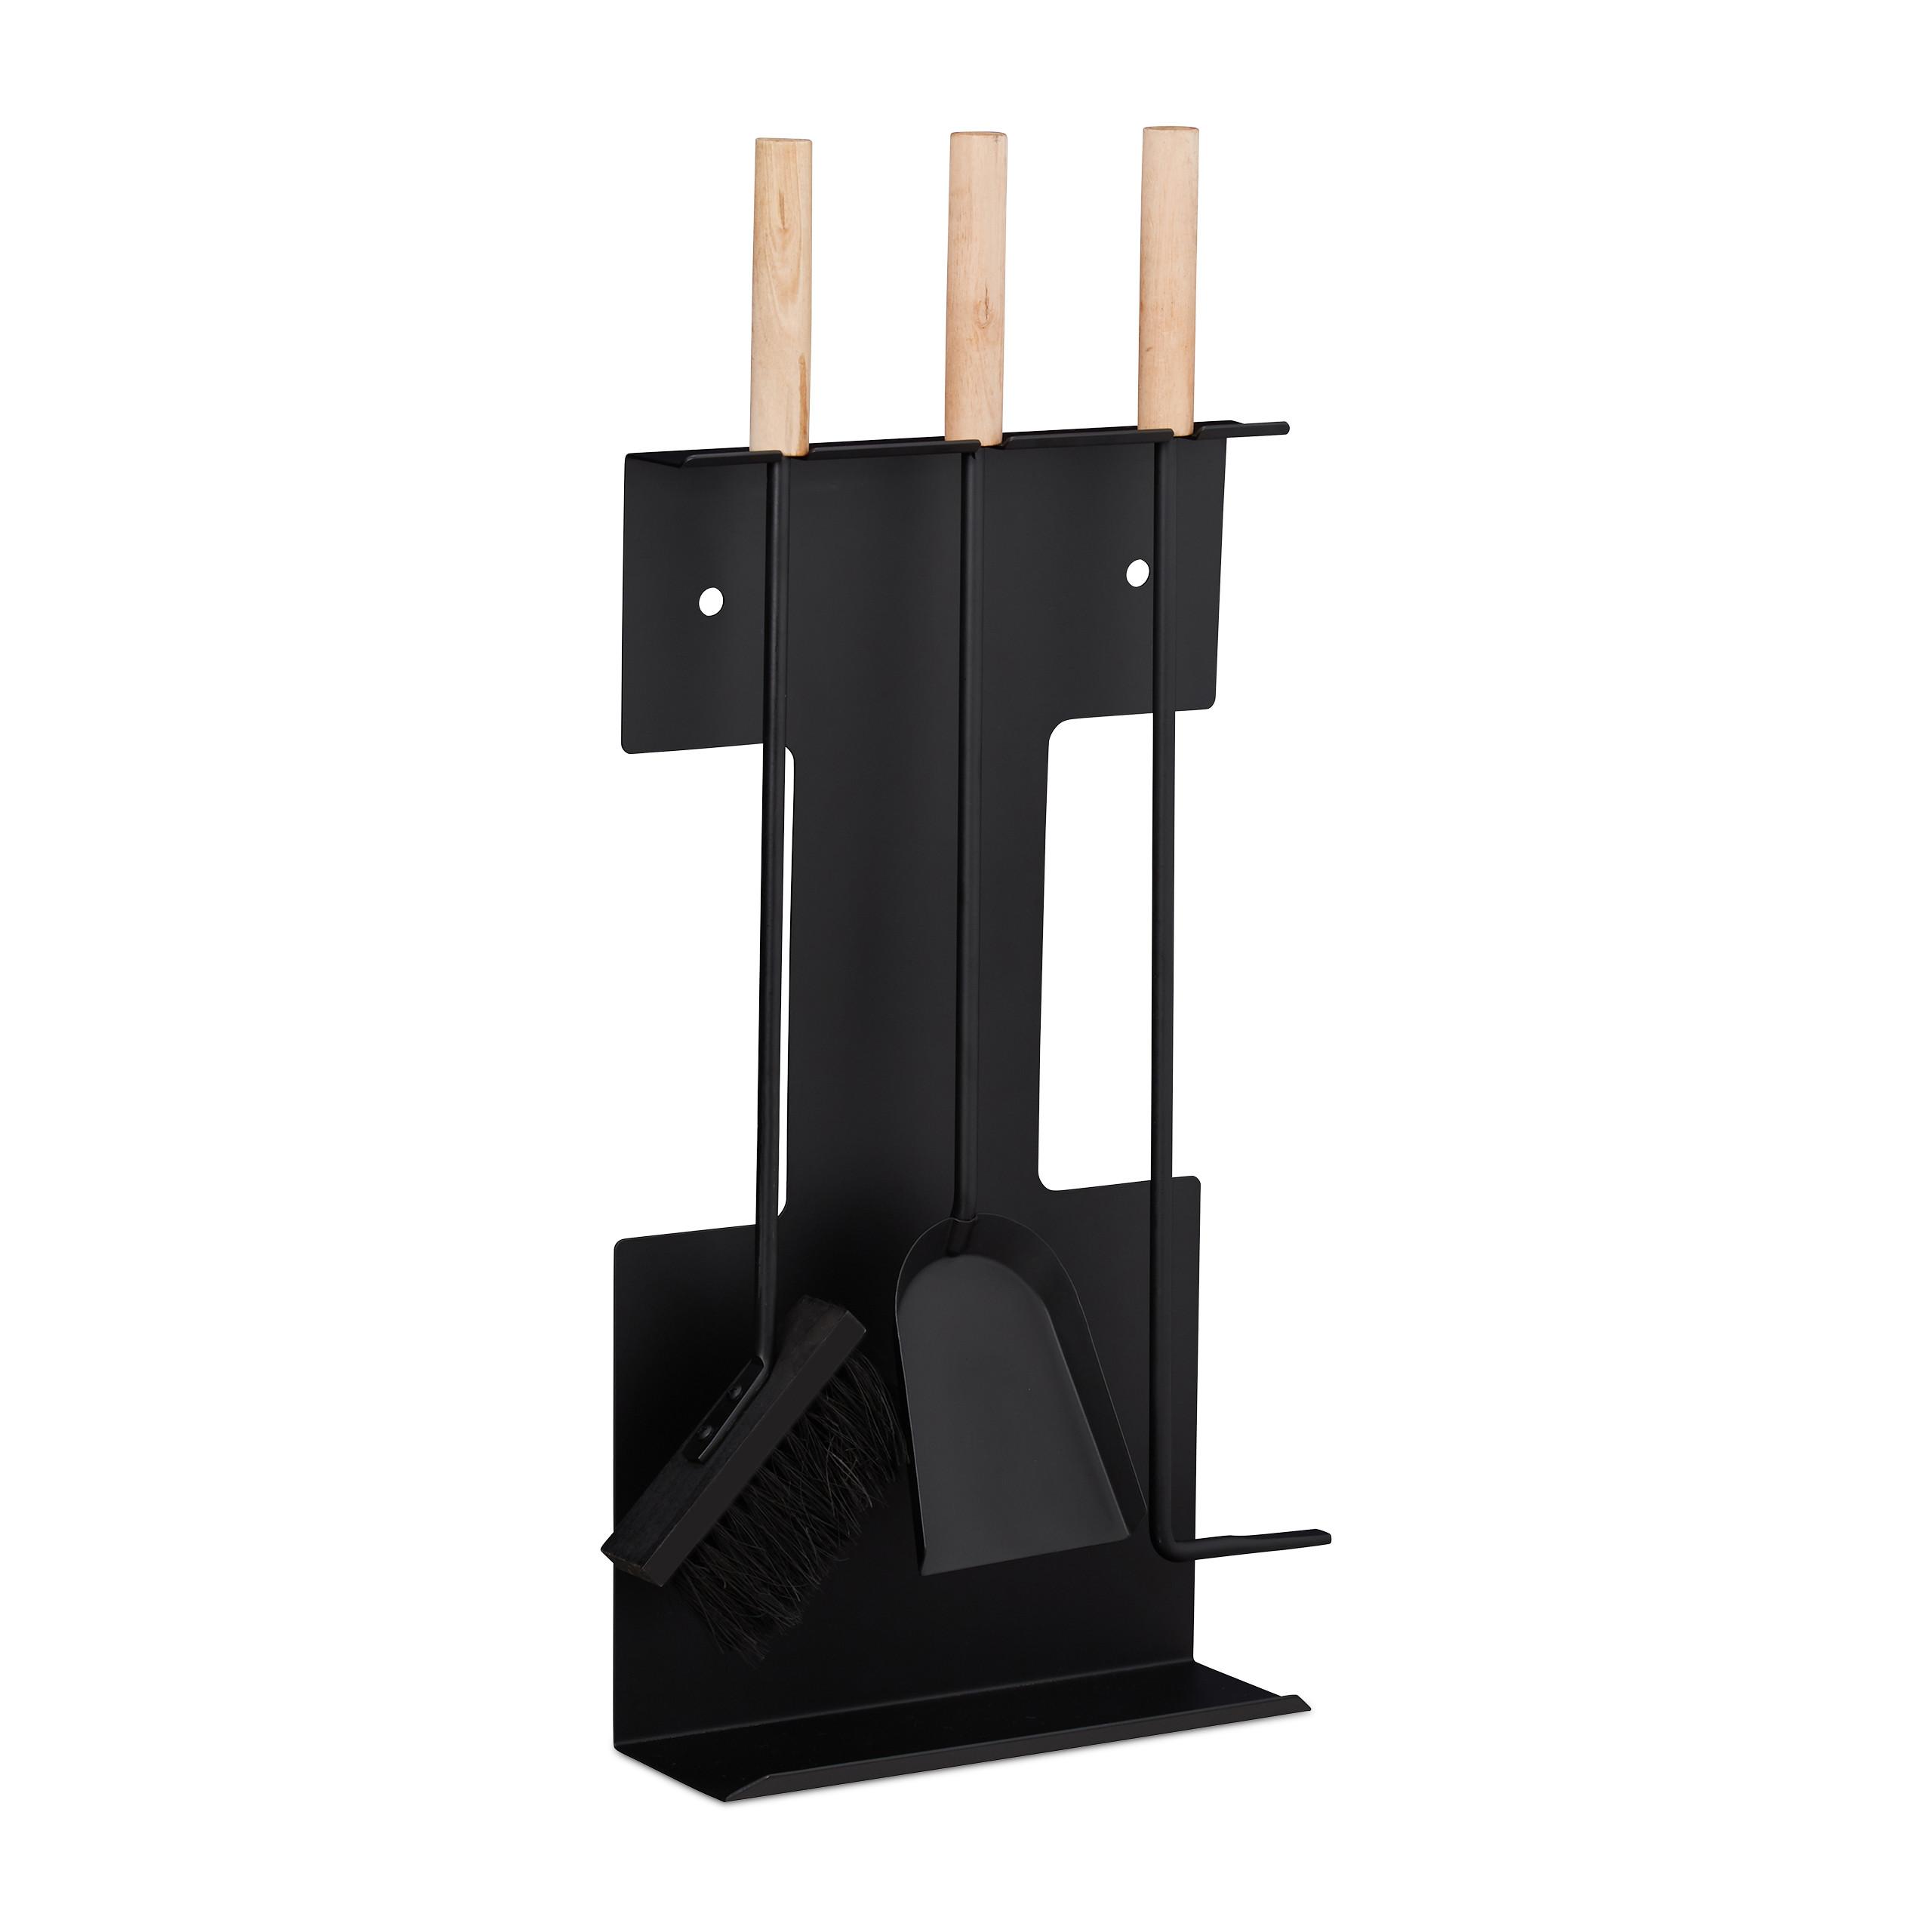 Kaminbesteck Kamingarnitur Kaminzubehör aus Messing 70cm Höhe 5-teiliges Set